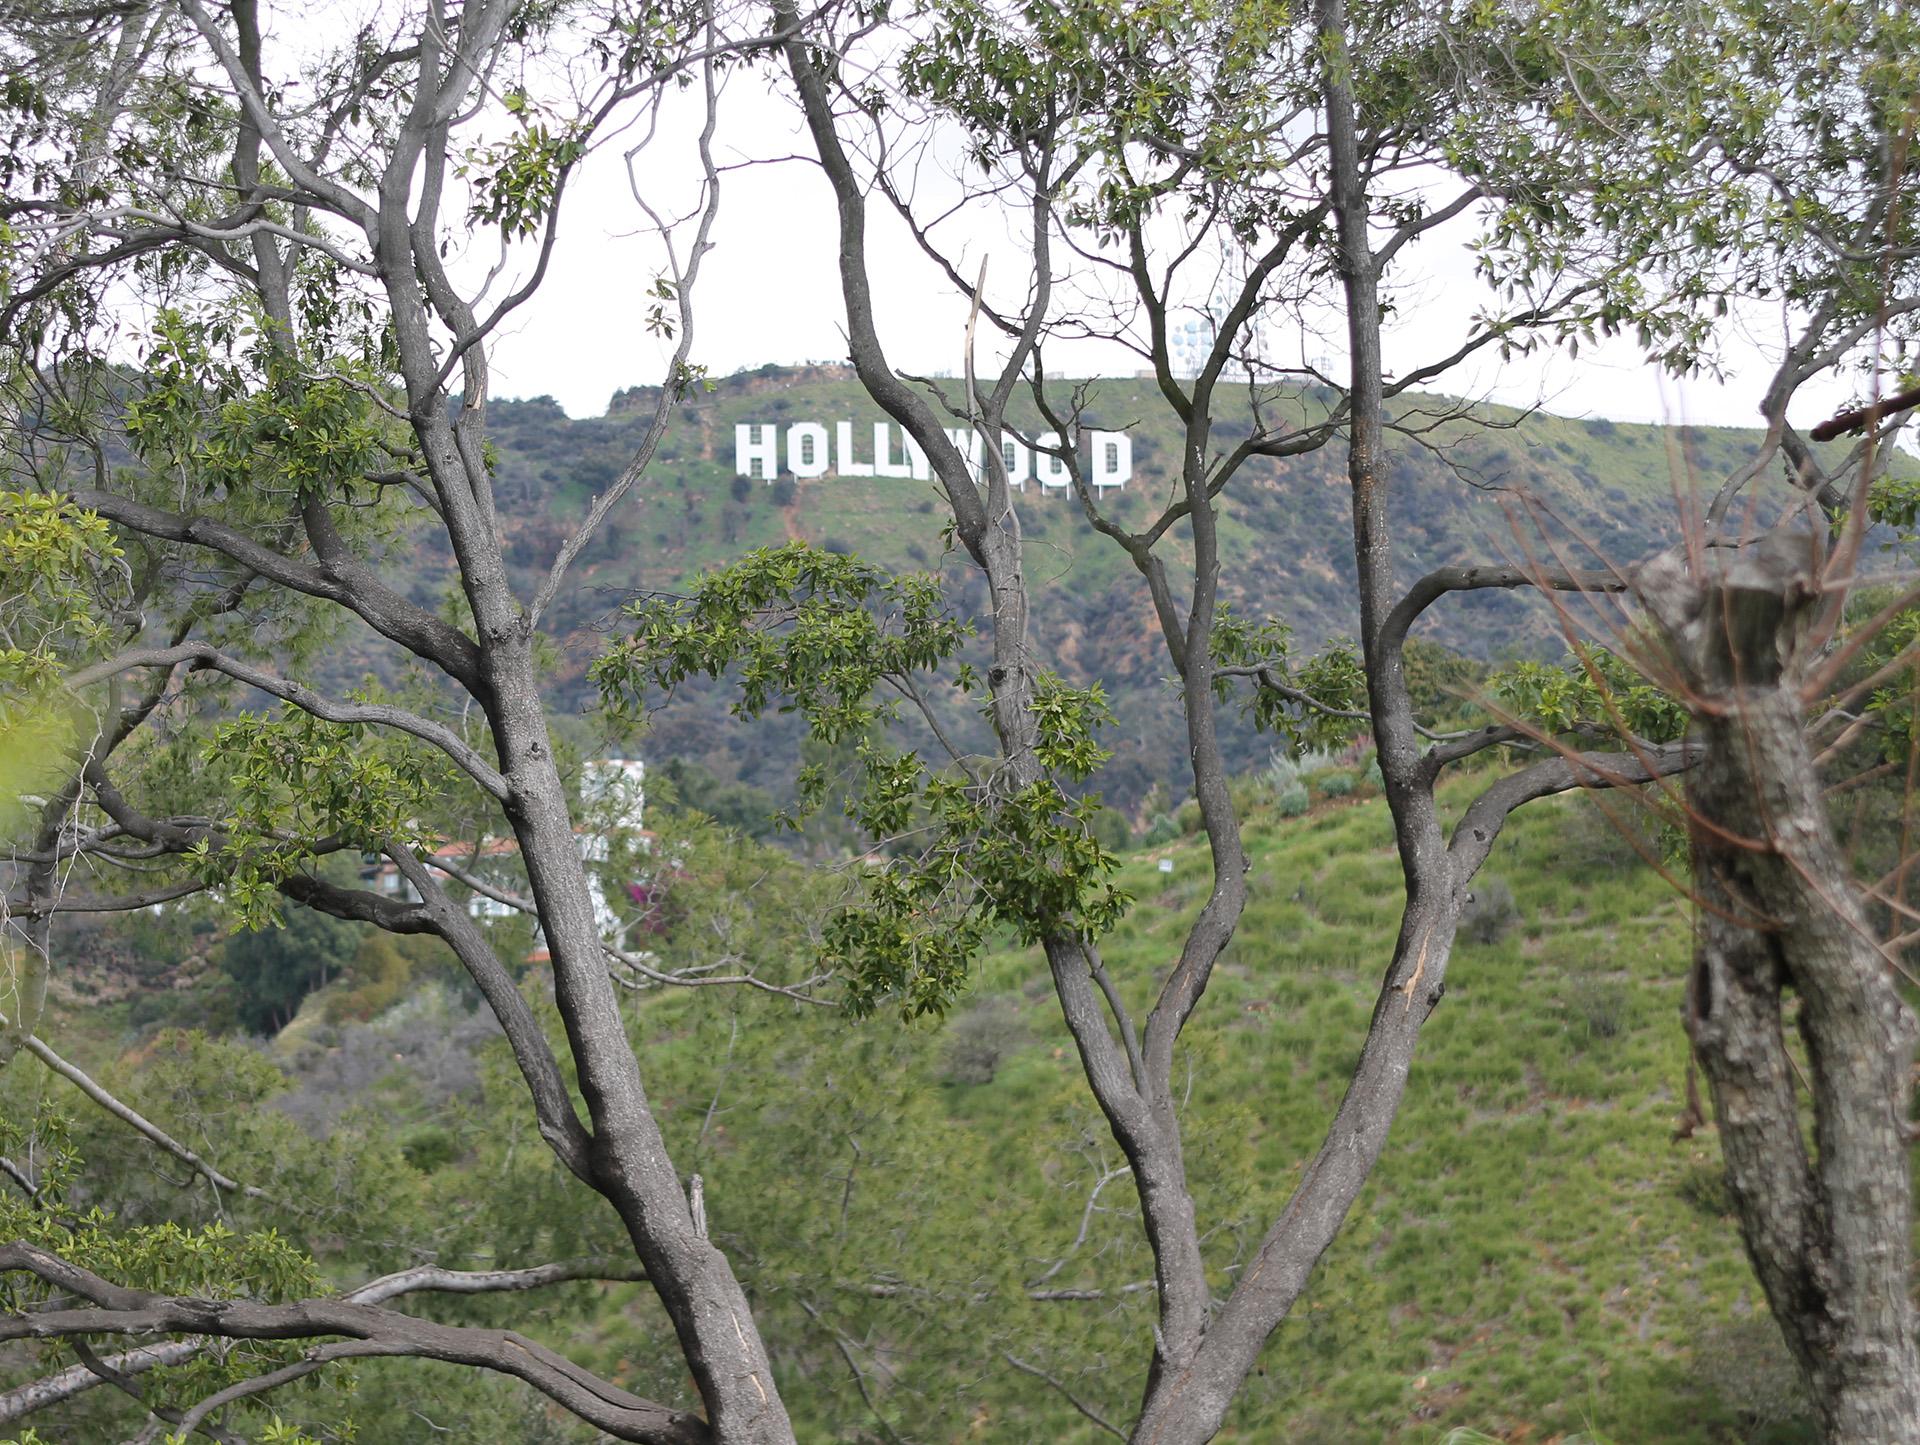 hight resolution of hollywood sign martin pierce jpg